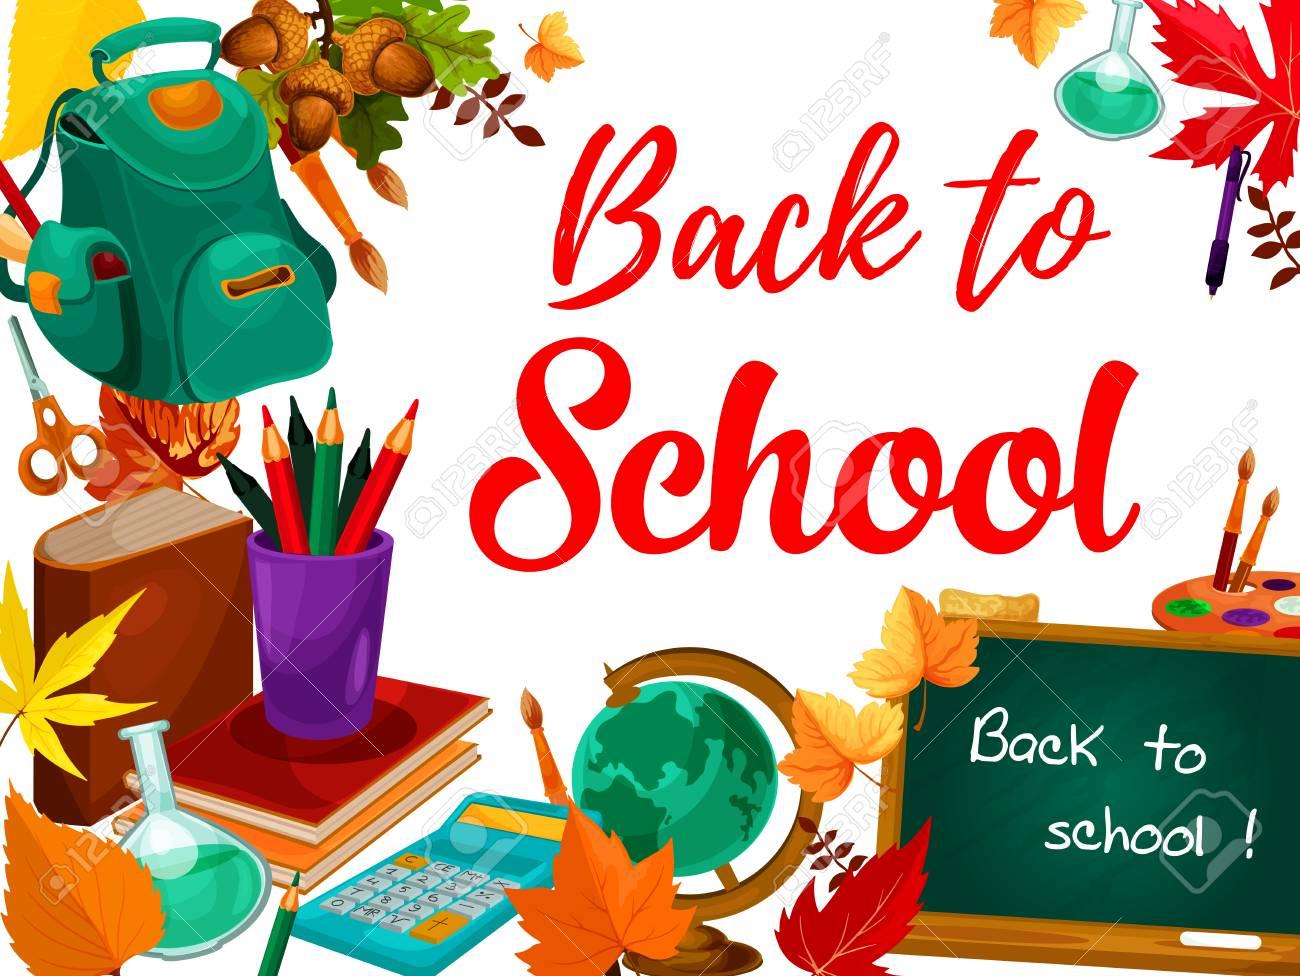 Back To School Chalk Text On Blackboard Greeting Card School